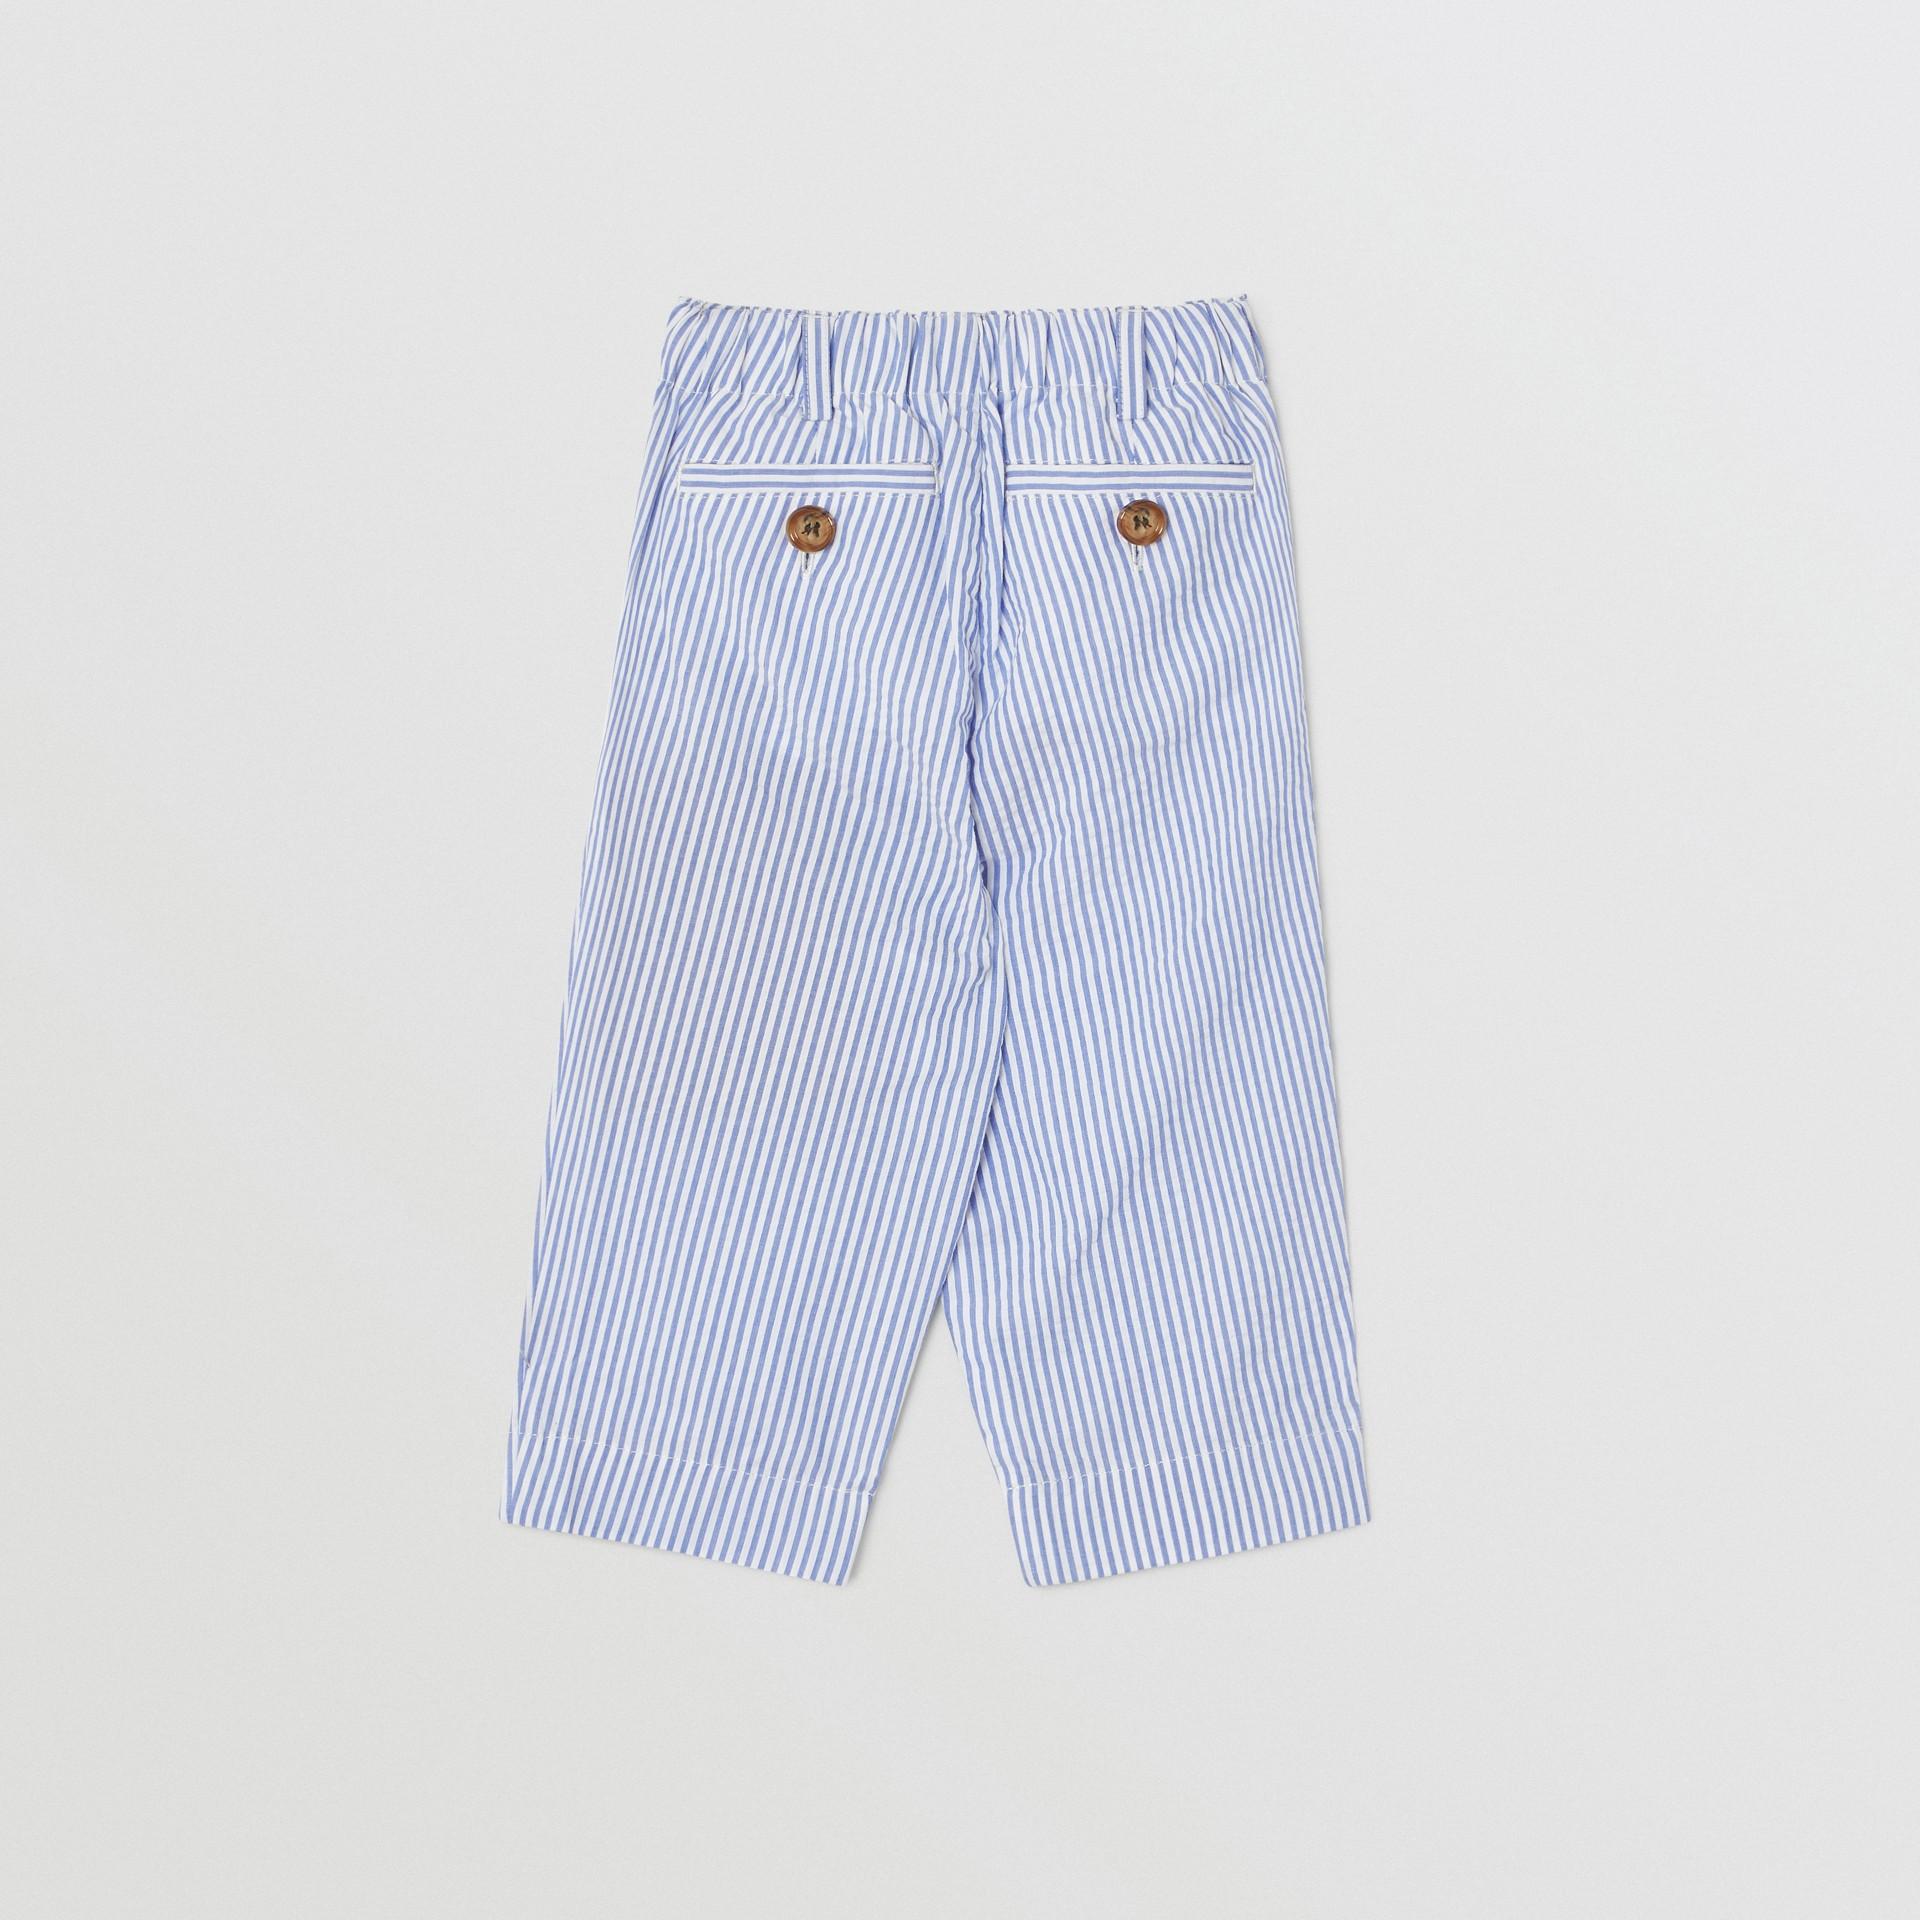 Striped Cotton Seersucker Tailored Trousers in Cornflower Blue - Children | Burberry - gallery image 3